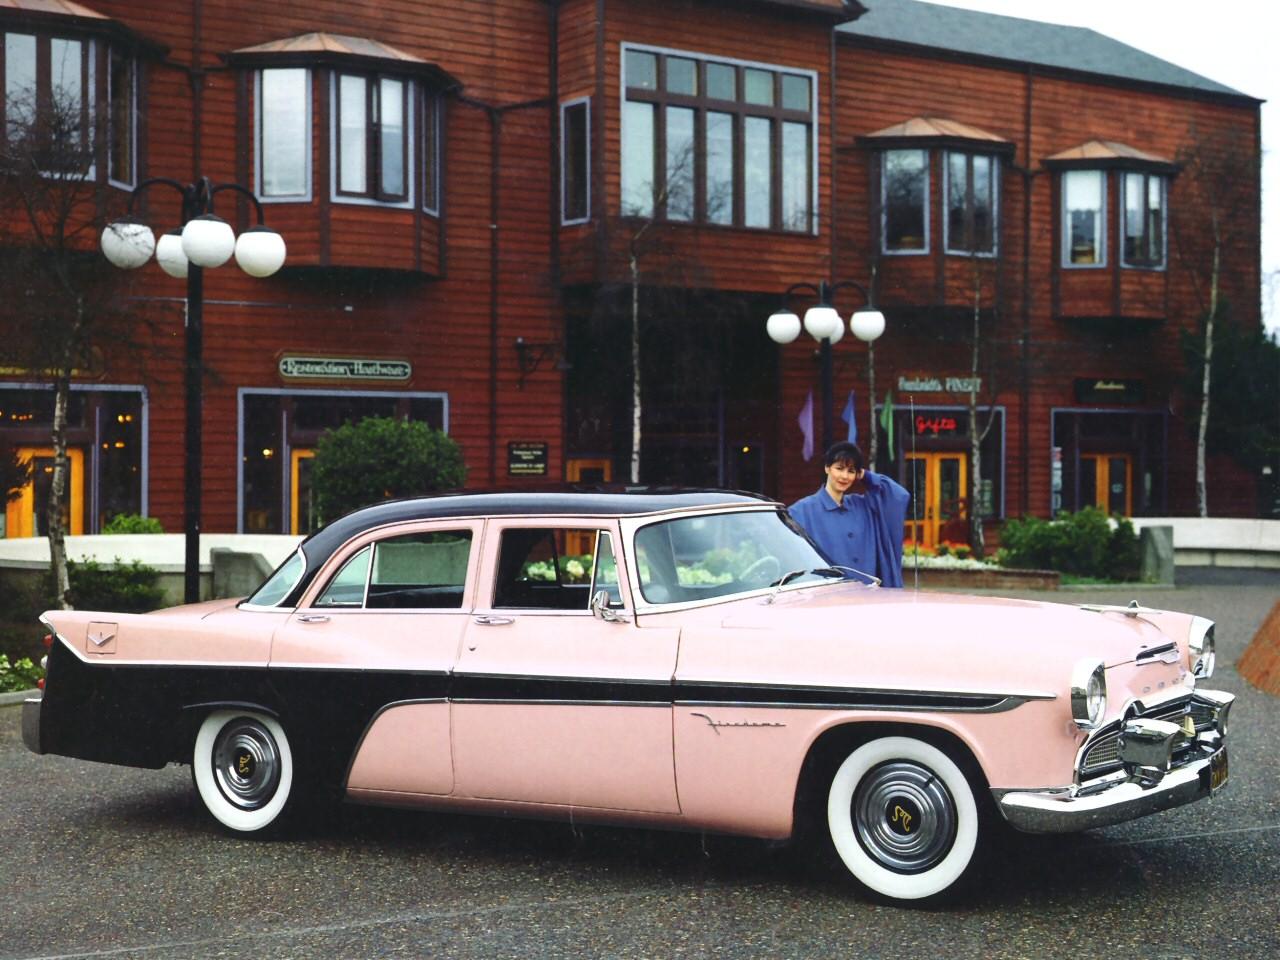 1956 DeSoto Firedome 4 Door Sedan Pink Black Fsvr